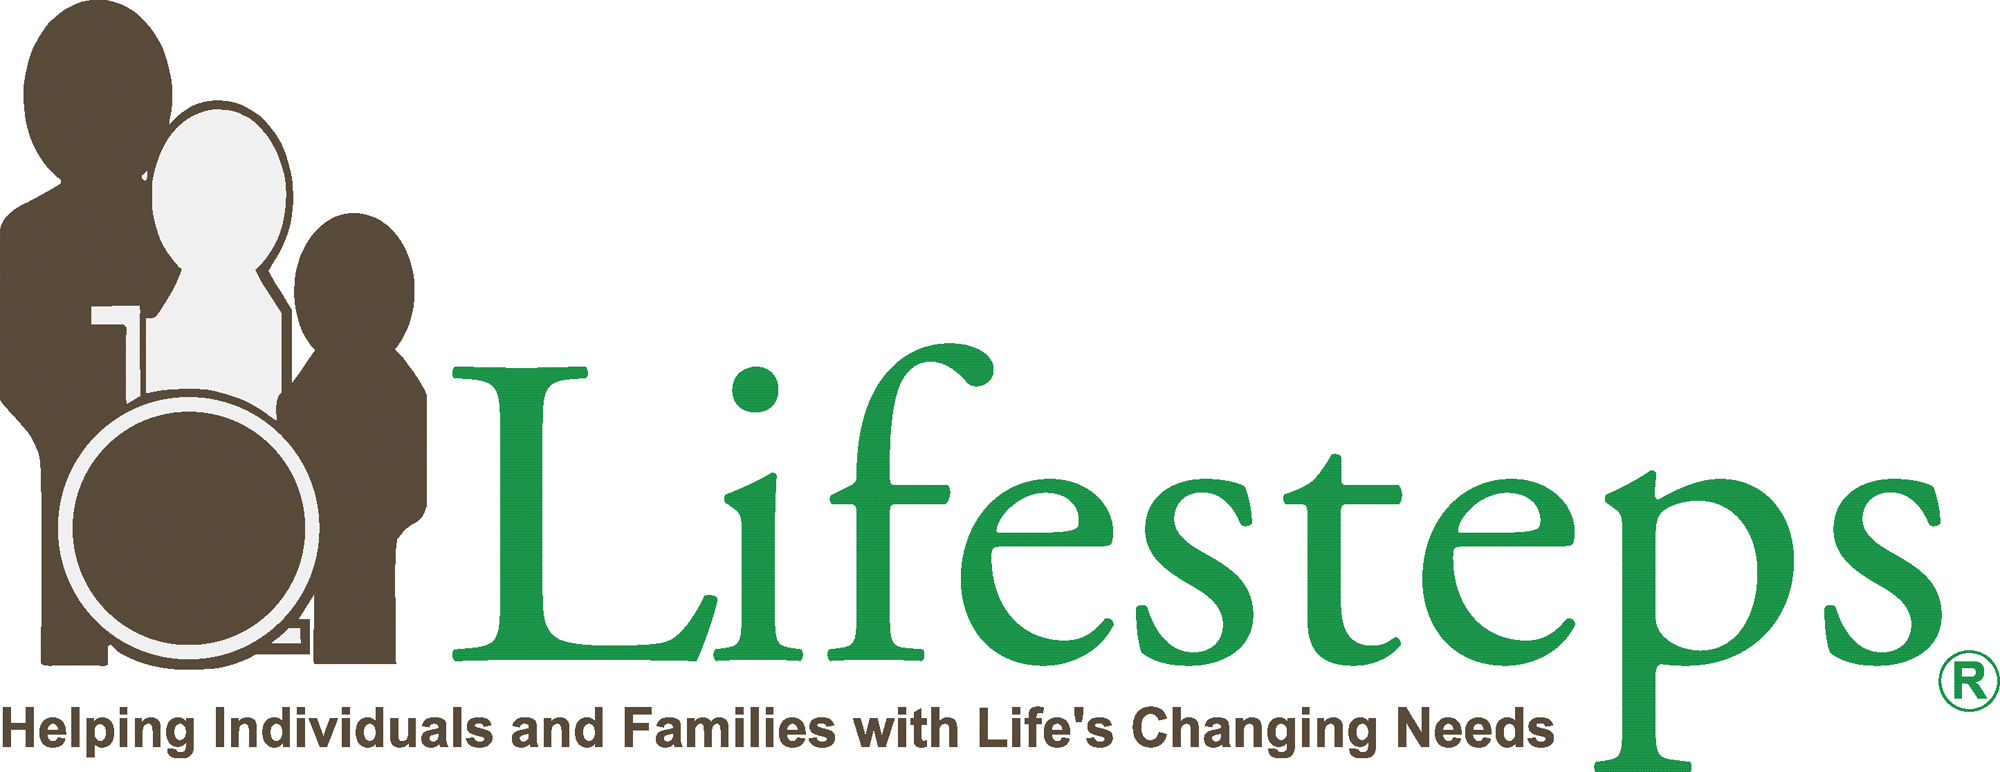 Lifesteps Inc Guidestar Profile